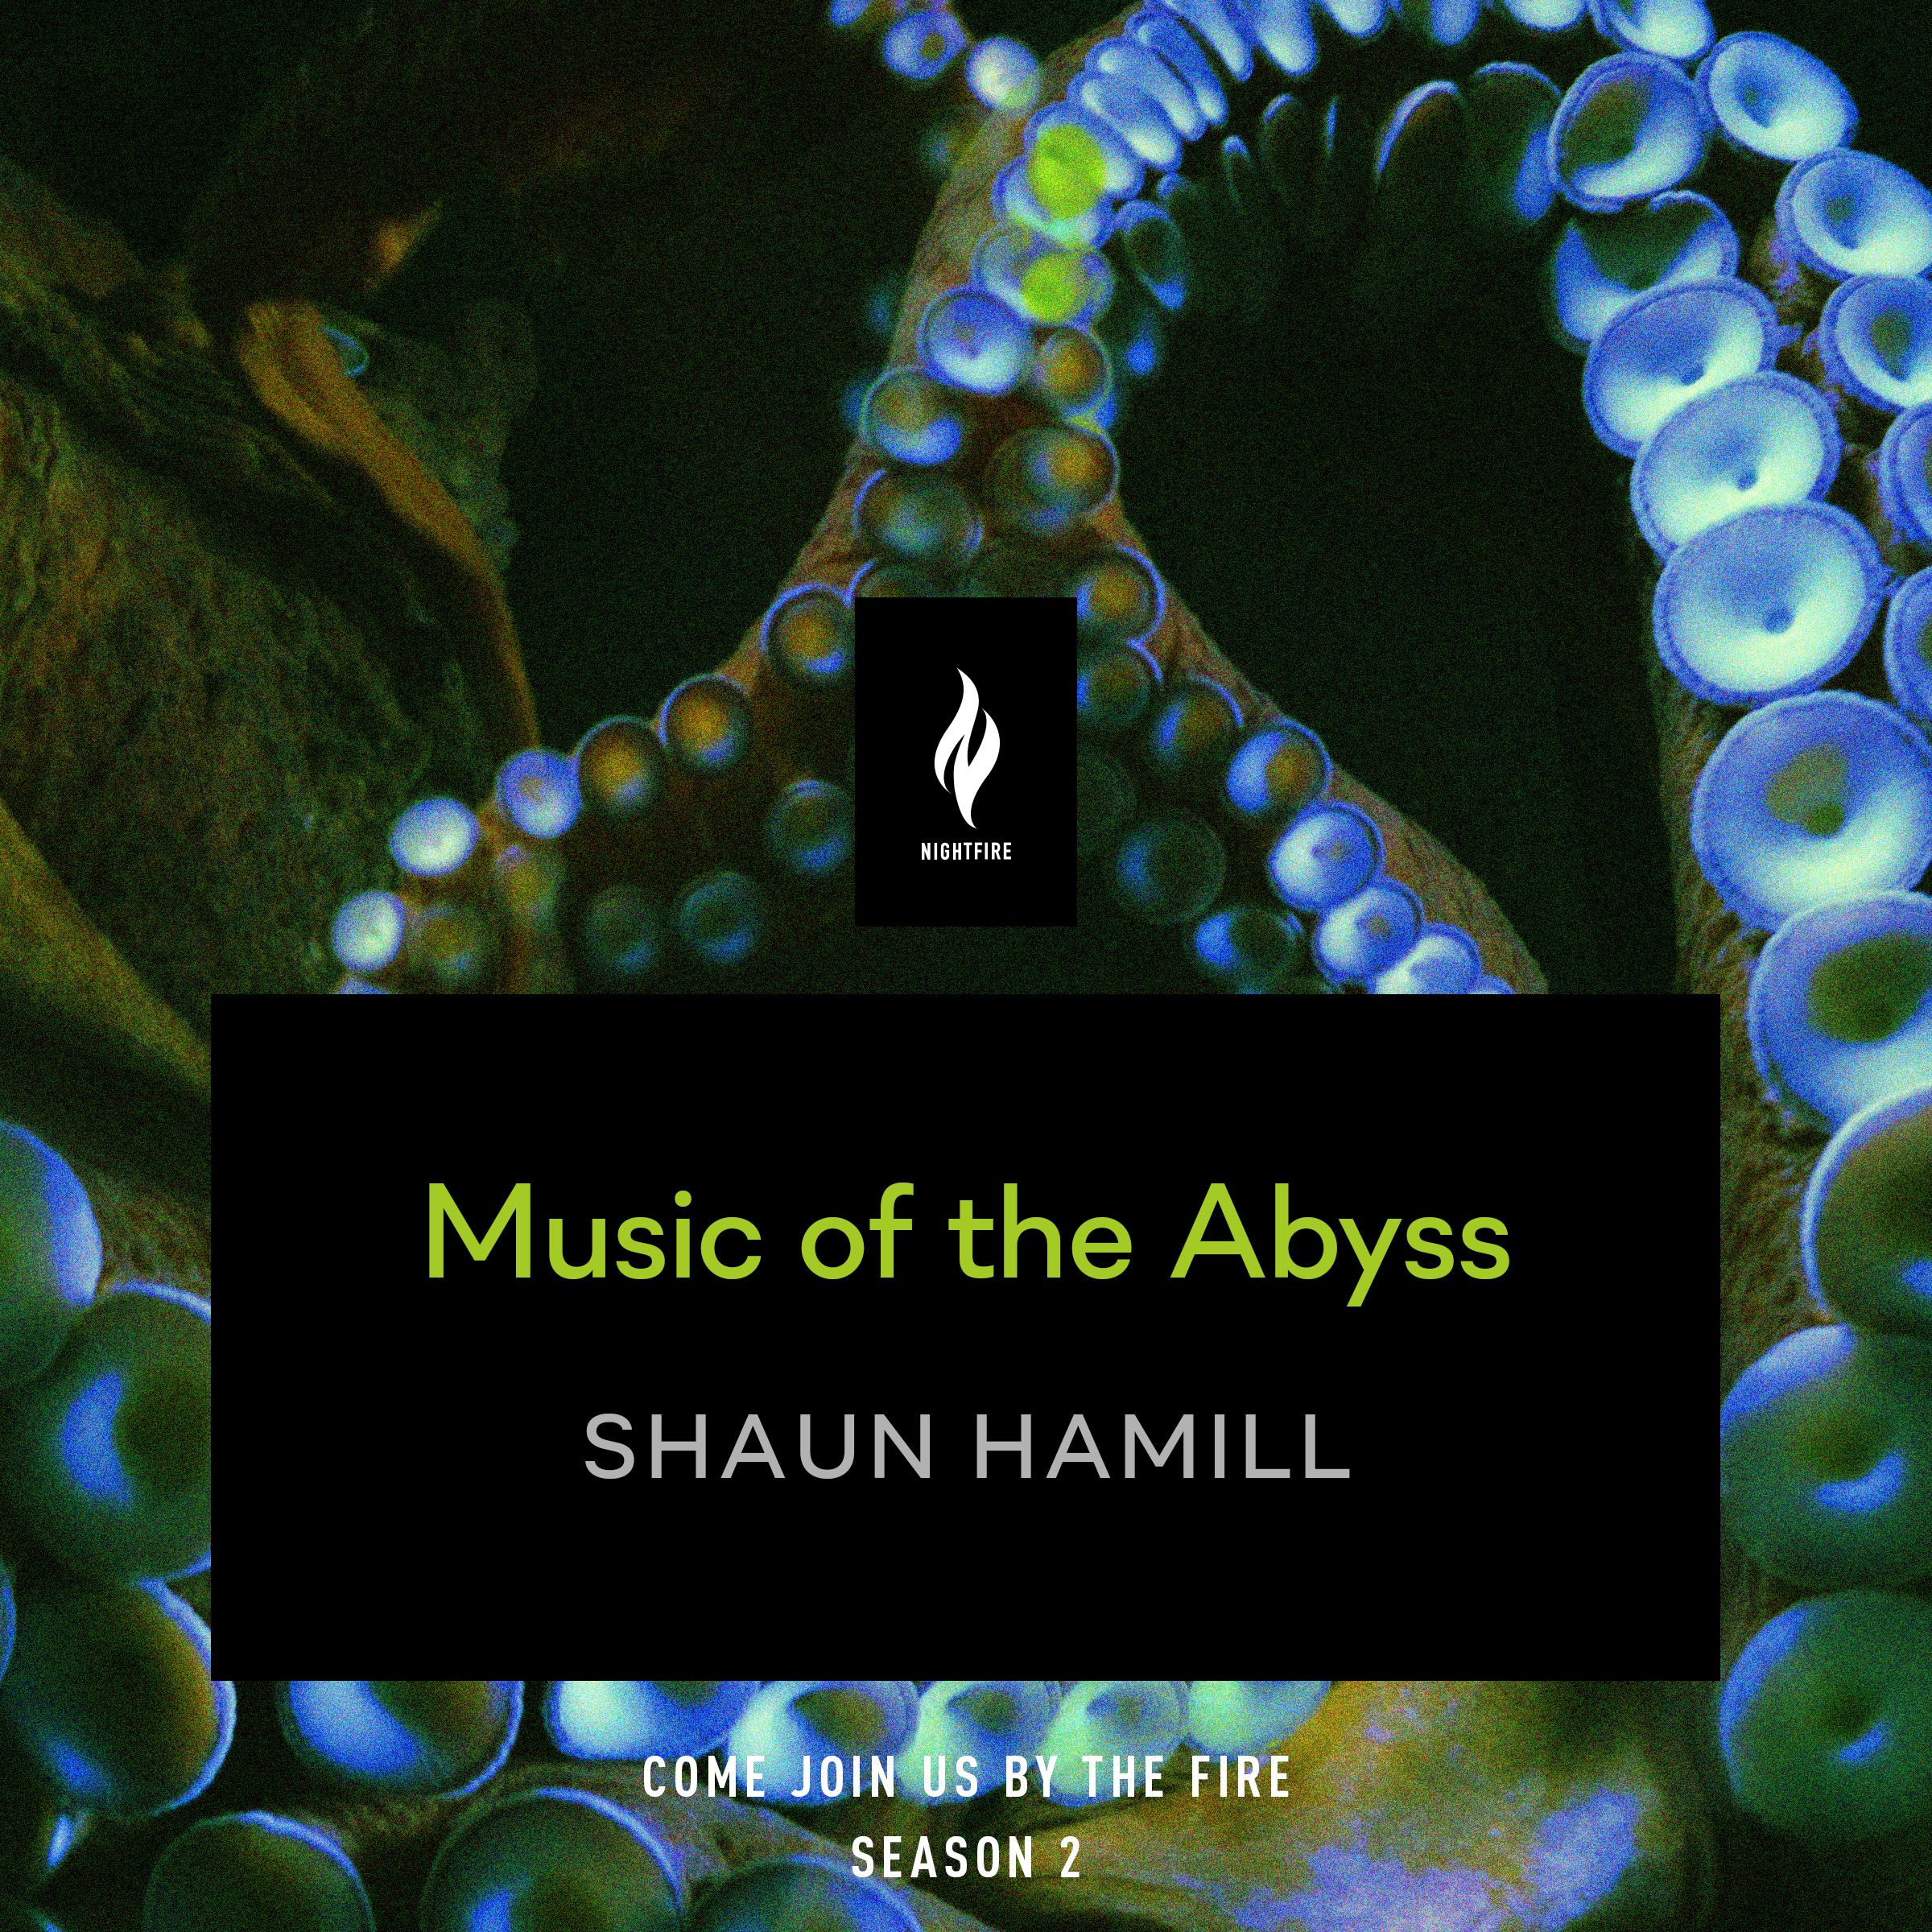 MusicoftheAbyss_Hamill